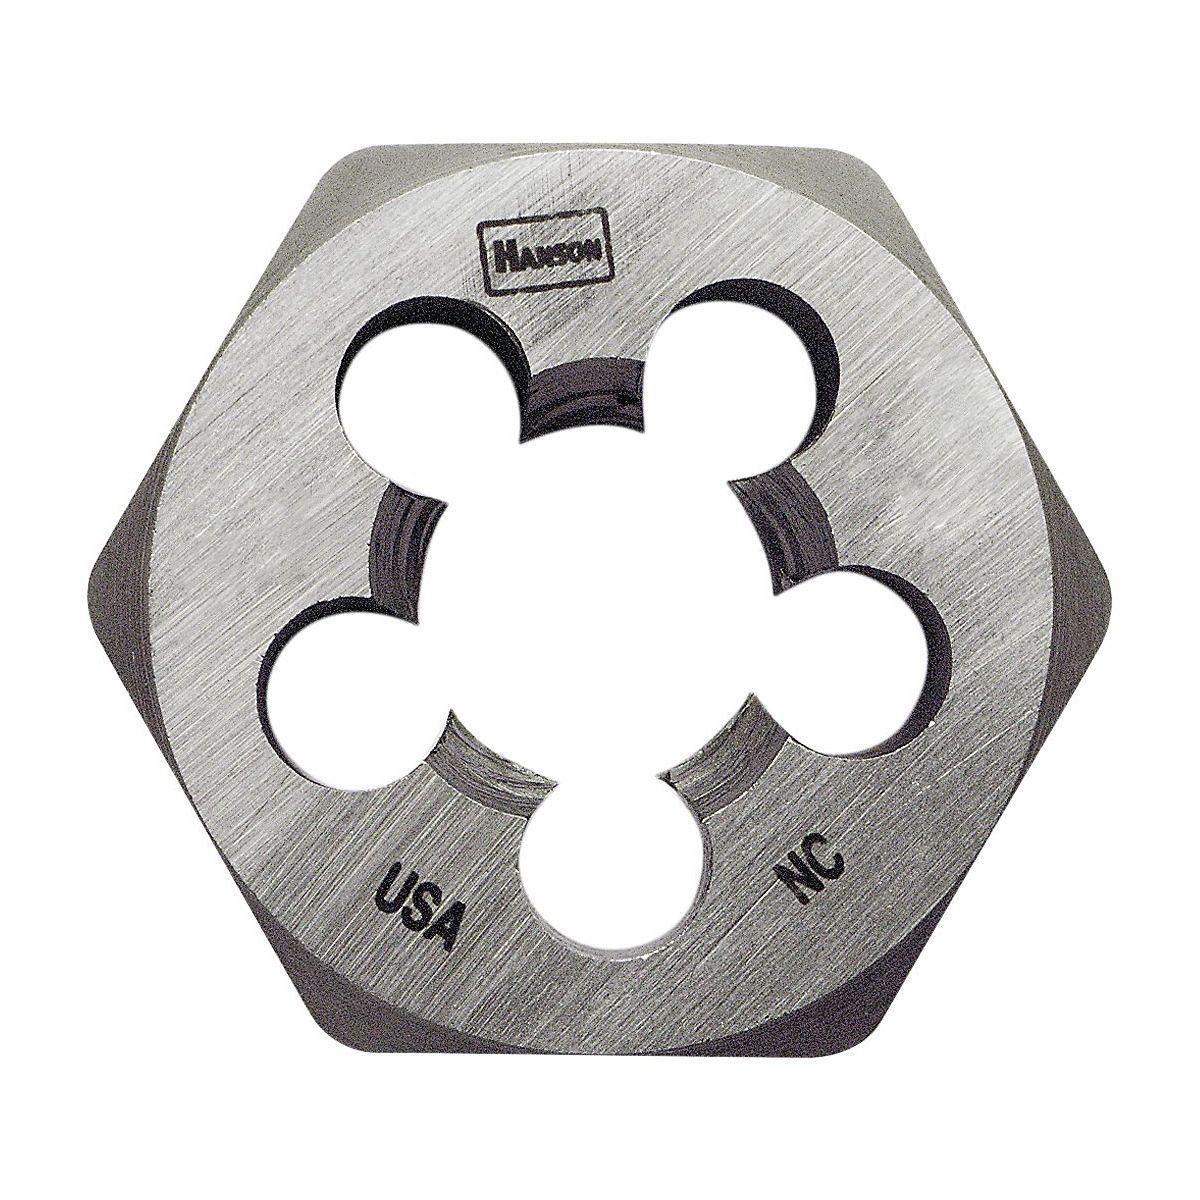 "HSS M18 x 1.50 1.5/"" OD Left Hand Round Adjustable Die Cutting Tools"